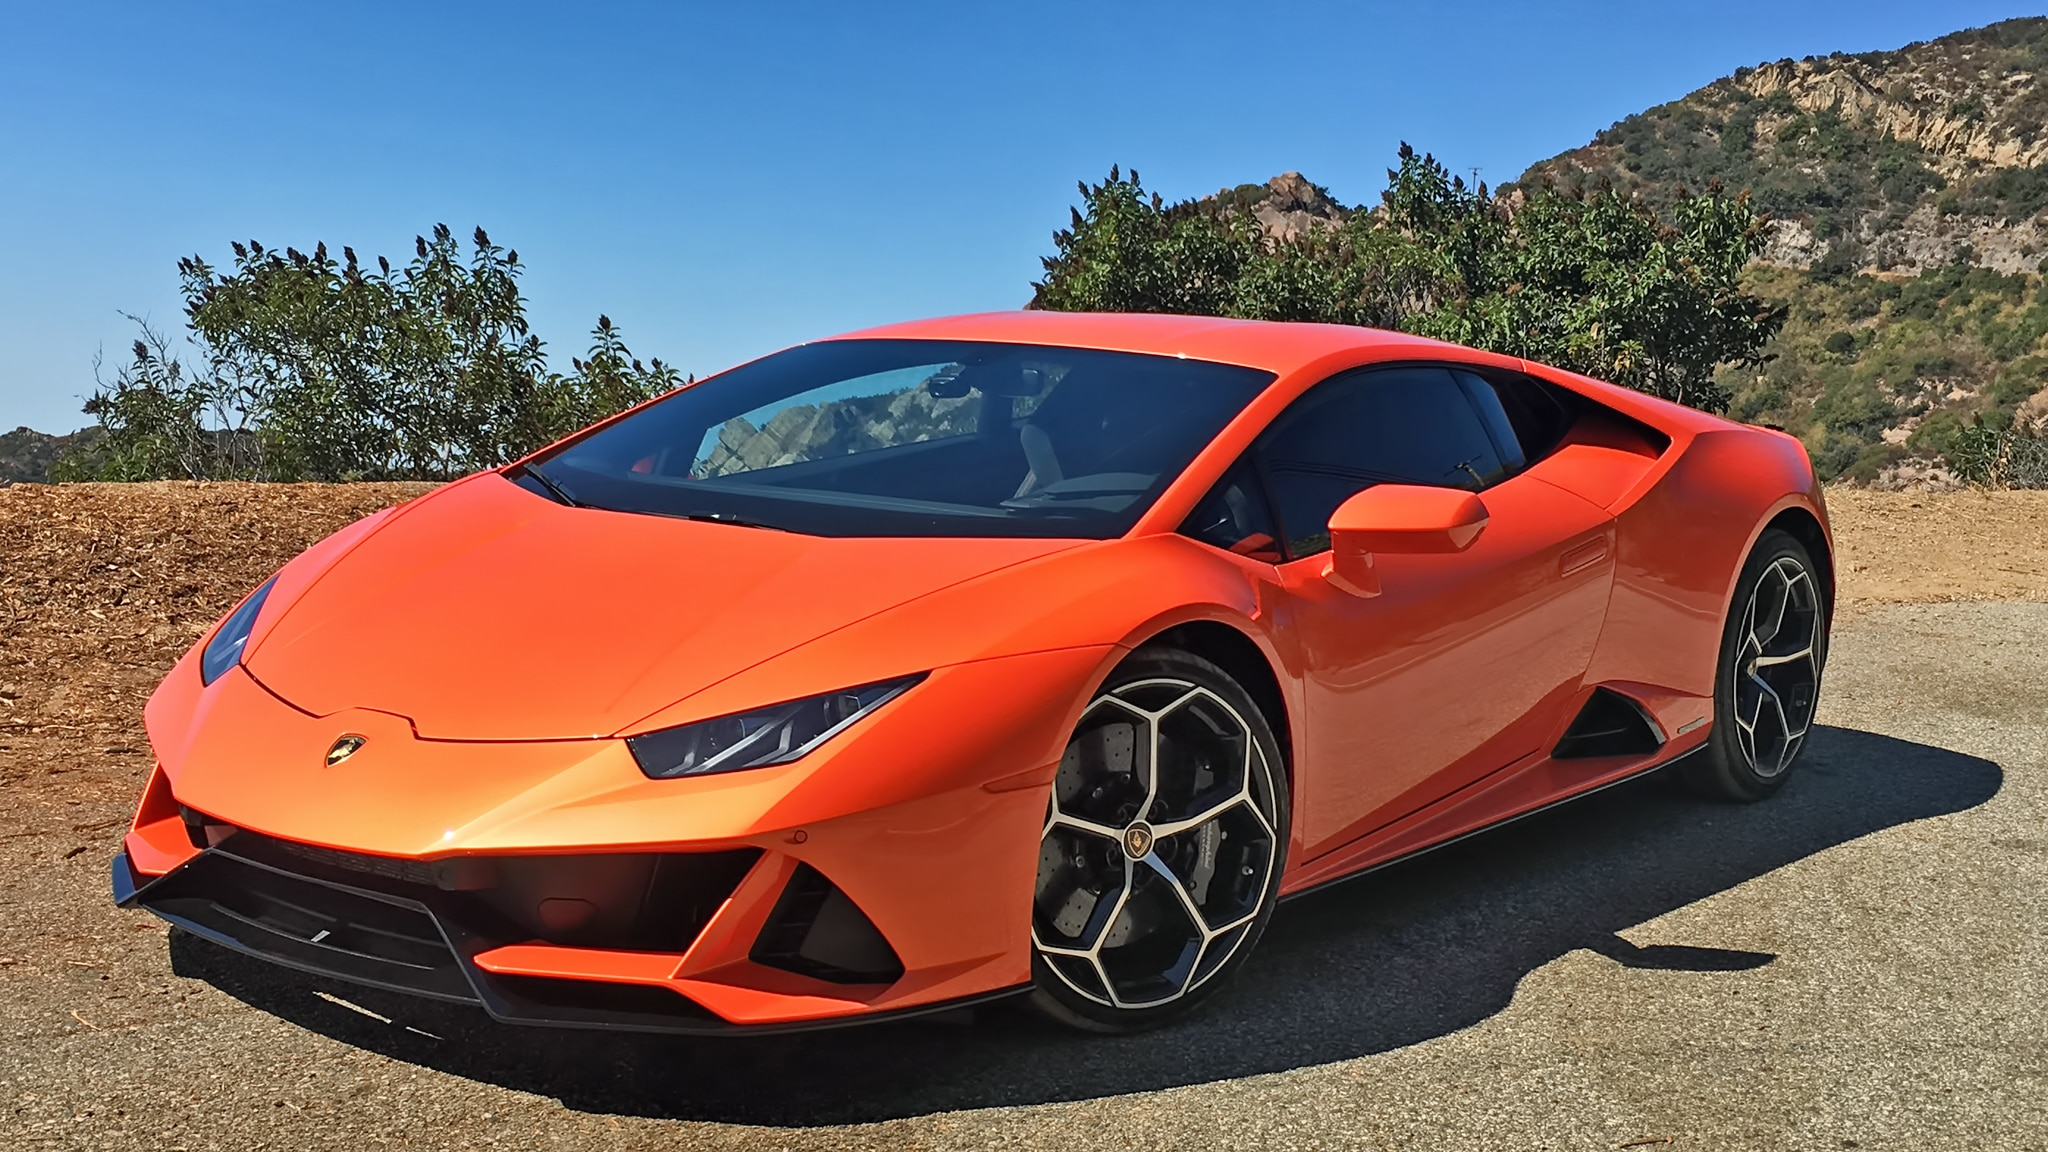 2020 Lamborghini Huracán Evo Review A Brain Blender ...